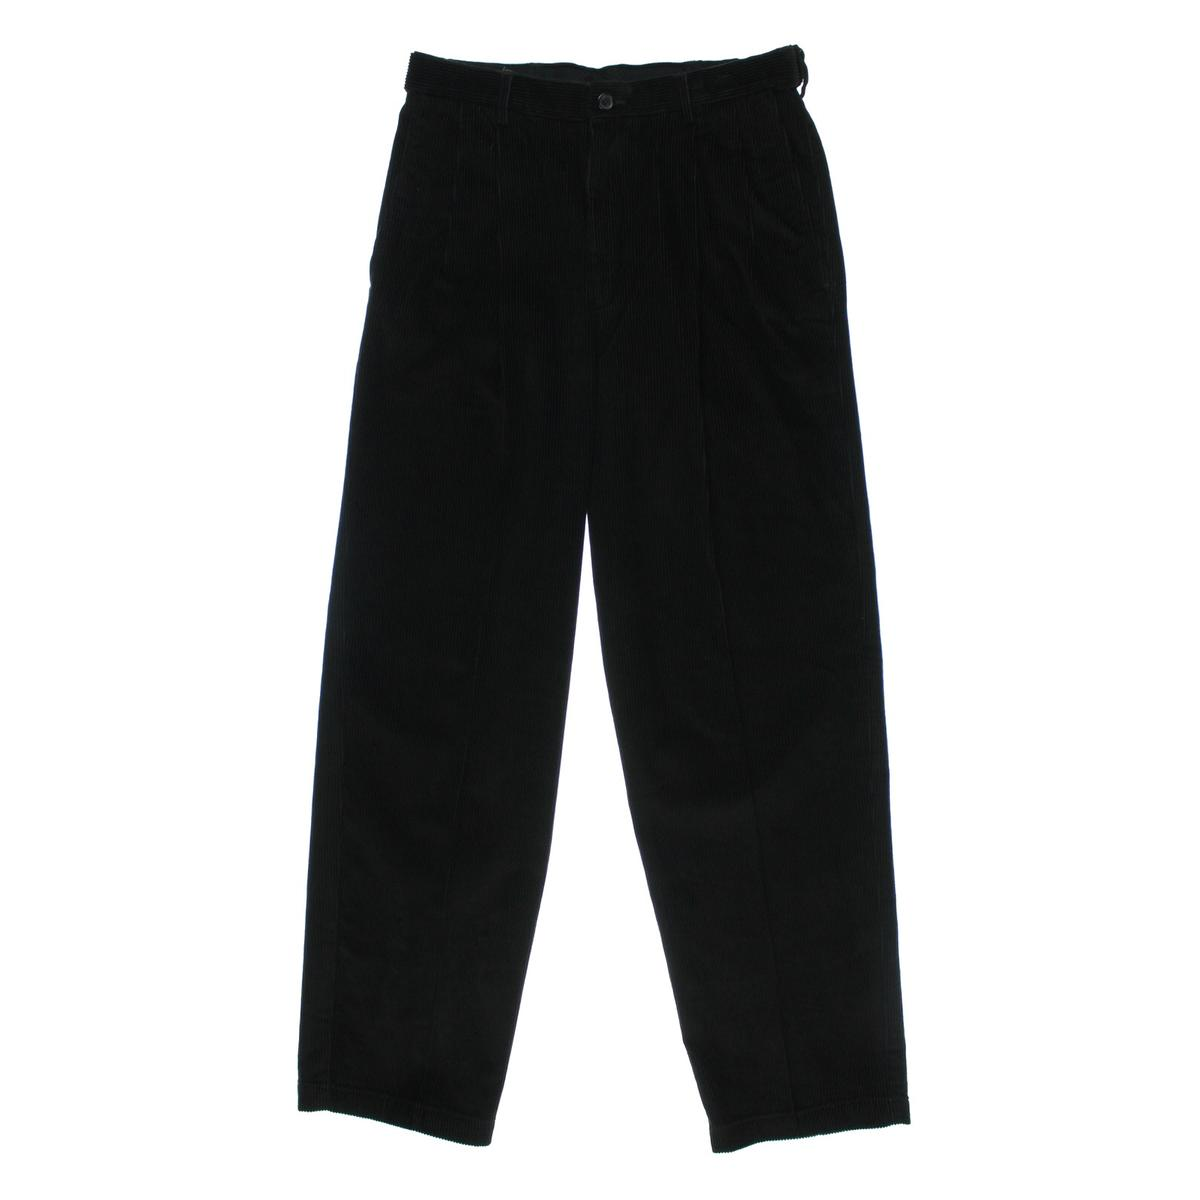 Mens Comfort Waist Corduroy Pants - Pant Row